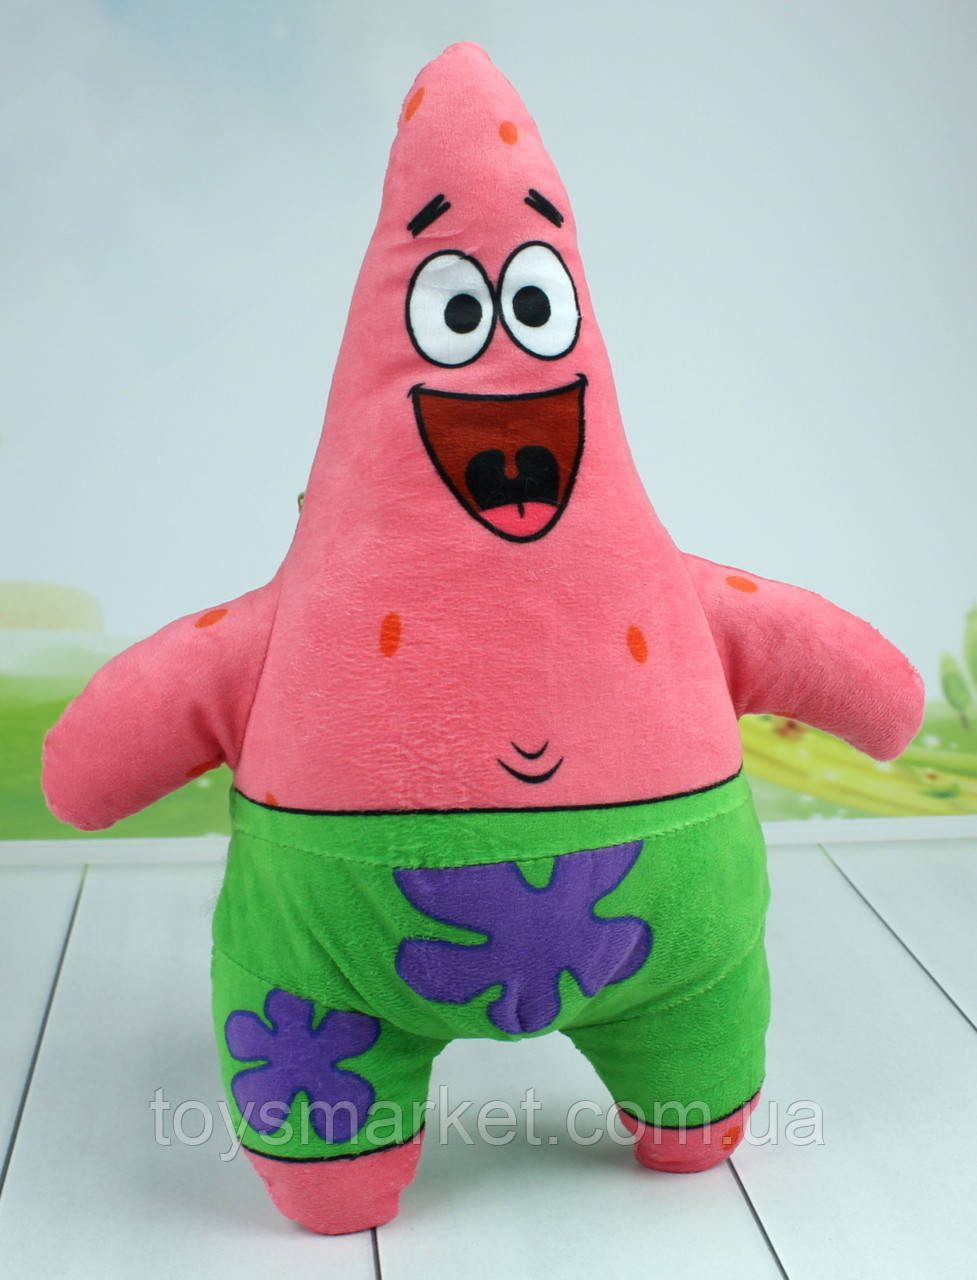 "Мягкая игрушка Патрик Стар, Патрик ""Губка Боб"", ""Губка Боб Квадратные Штаны."